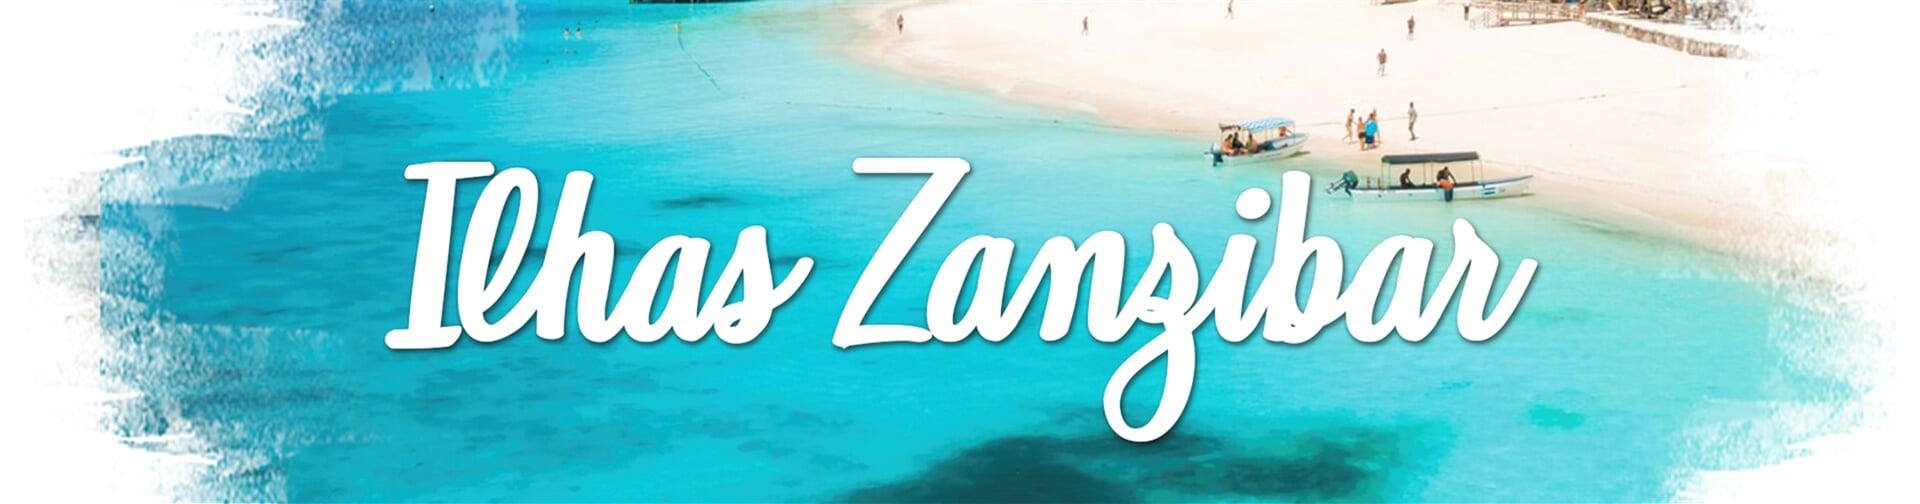 Ilhas Zanzibar